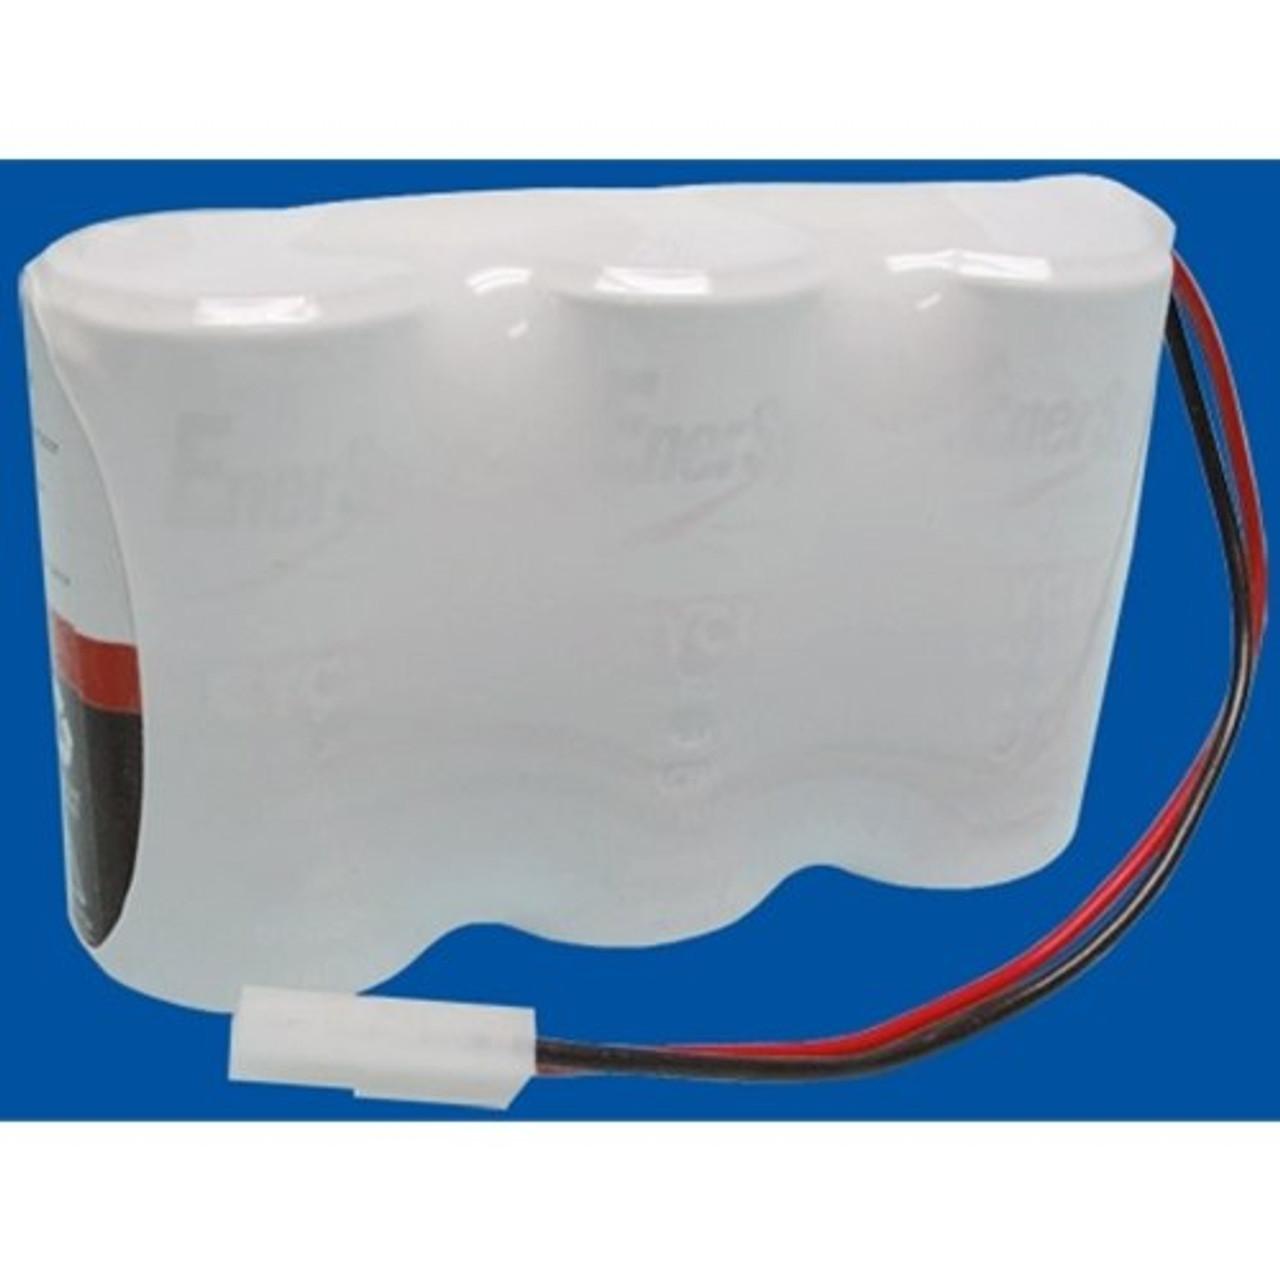 Life Care 2D, 3D, 3HB, 4D Infusion Pump